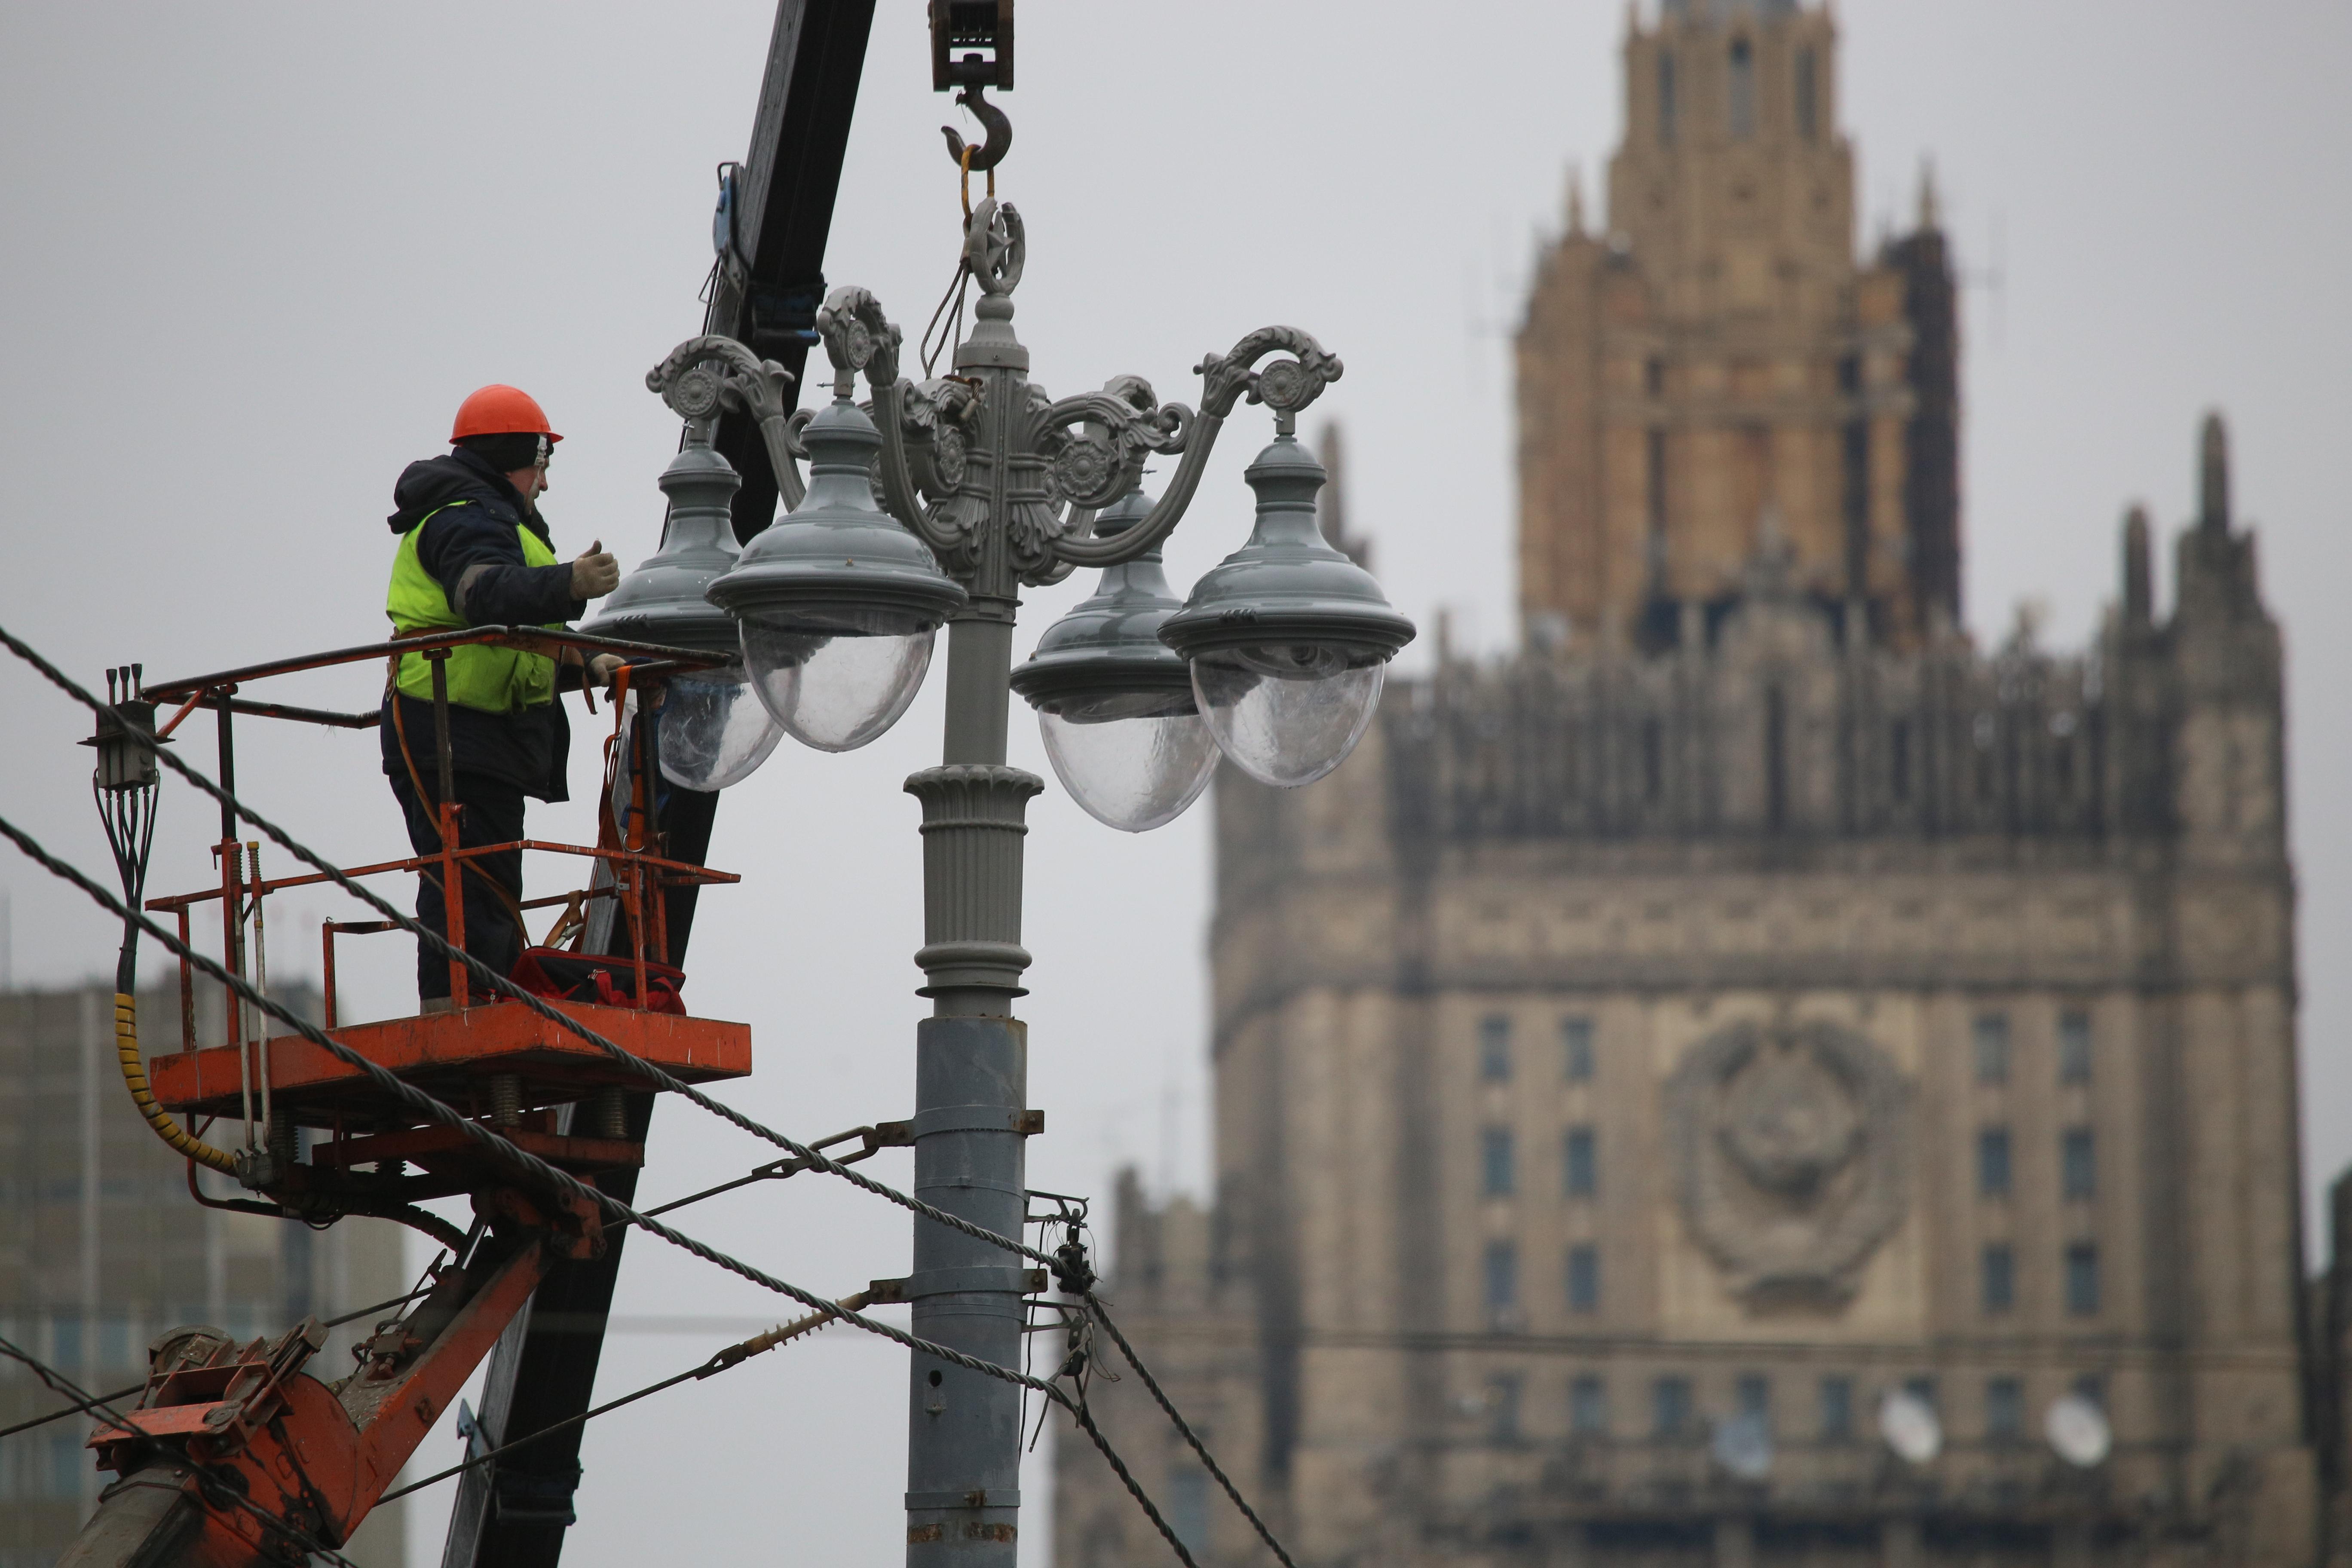 Москва перевела фонари на зимний режим